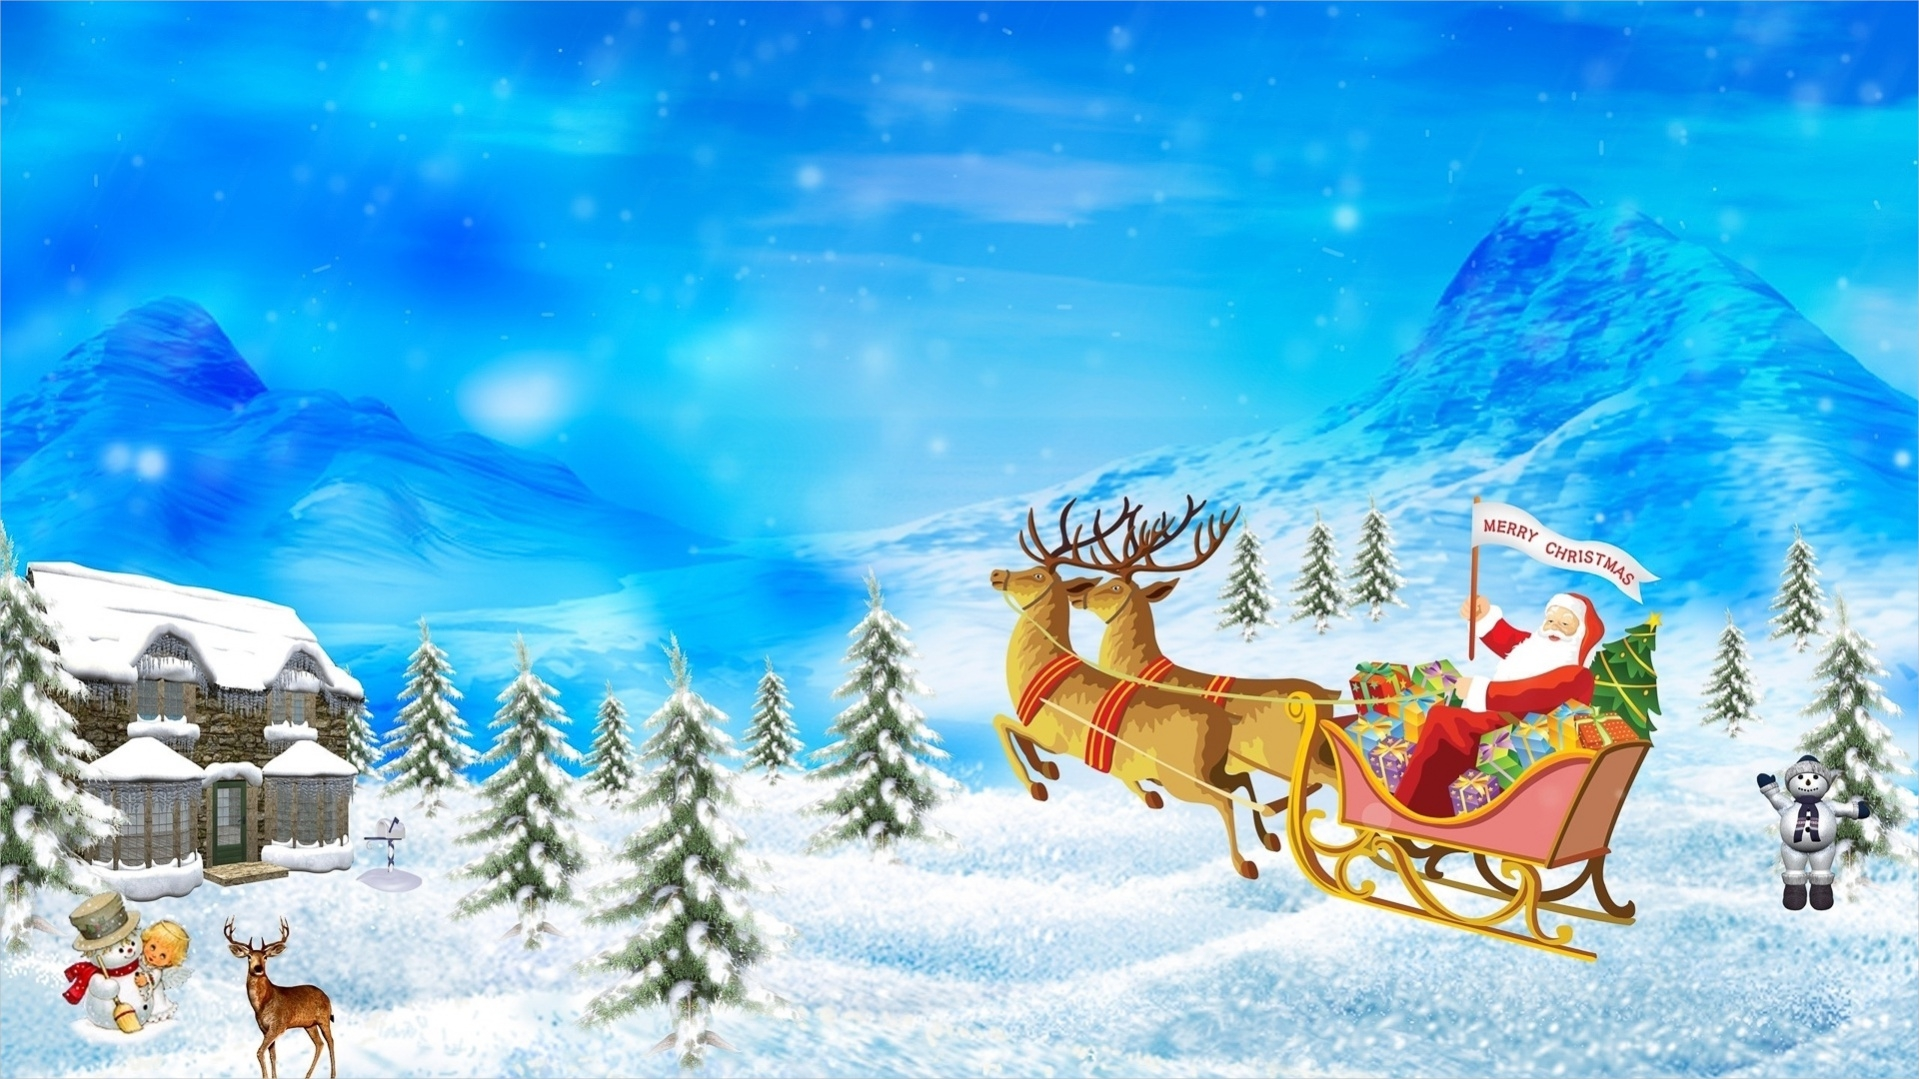 Digital Christmas Background